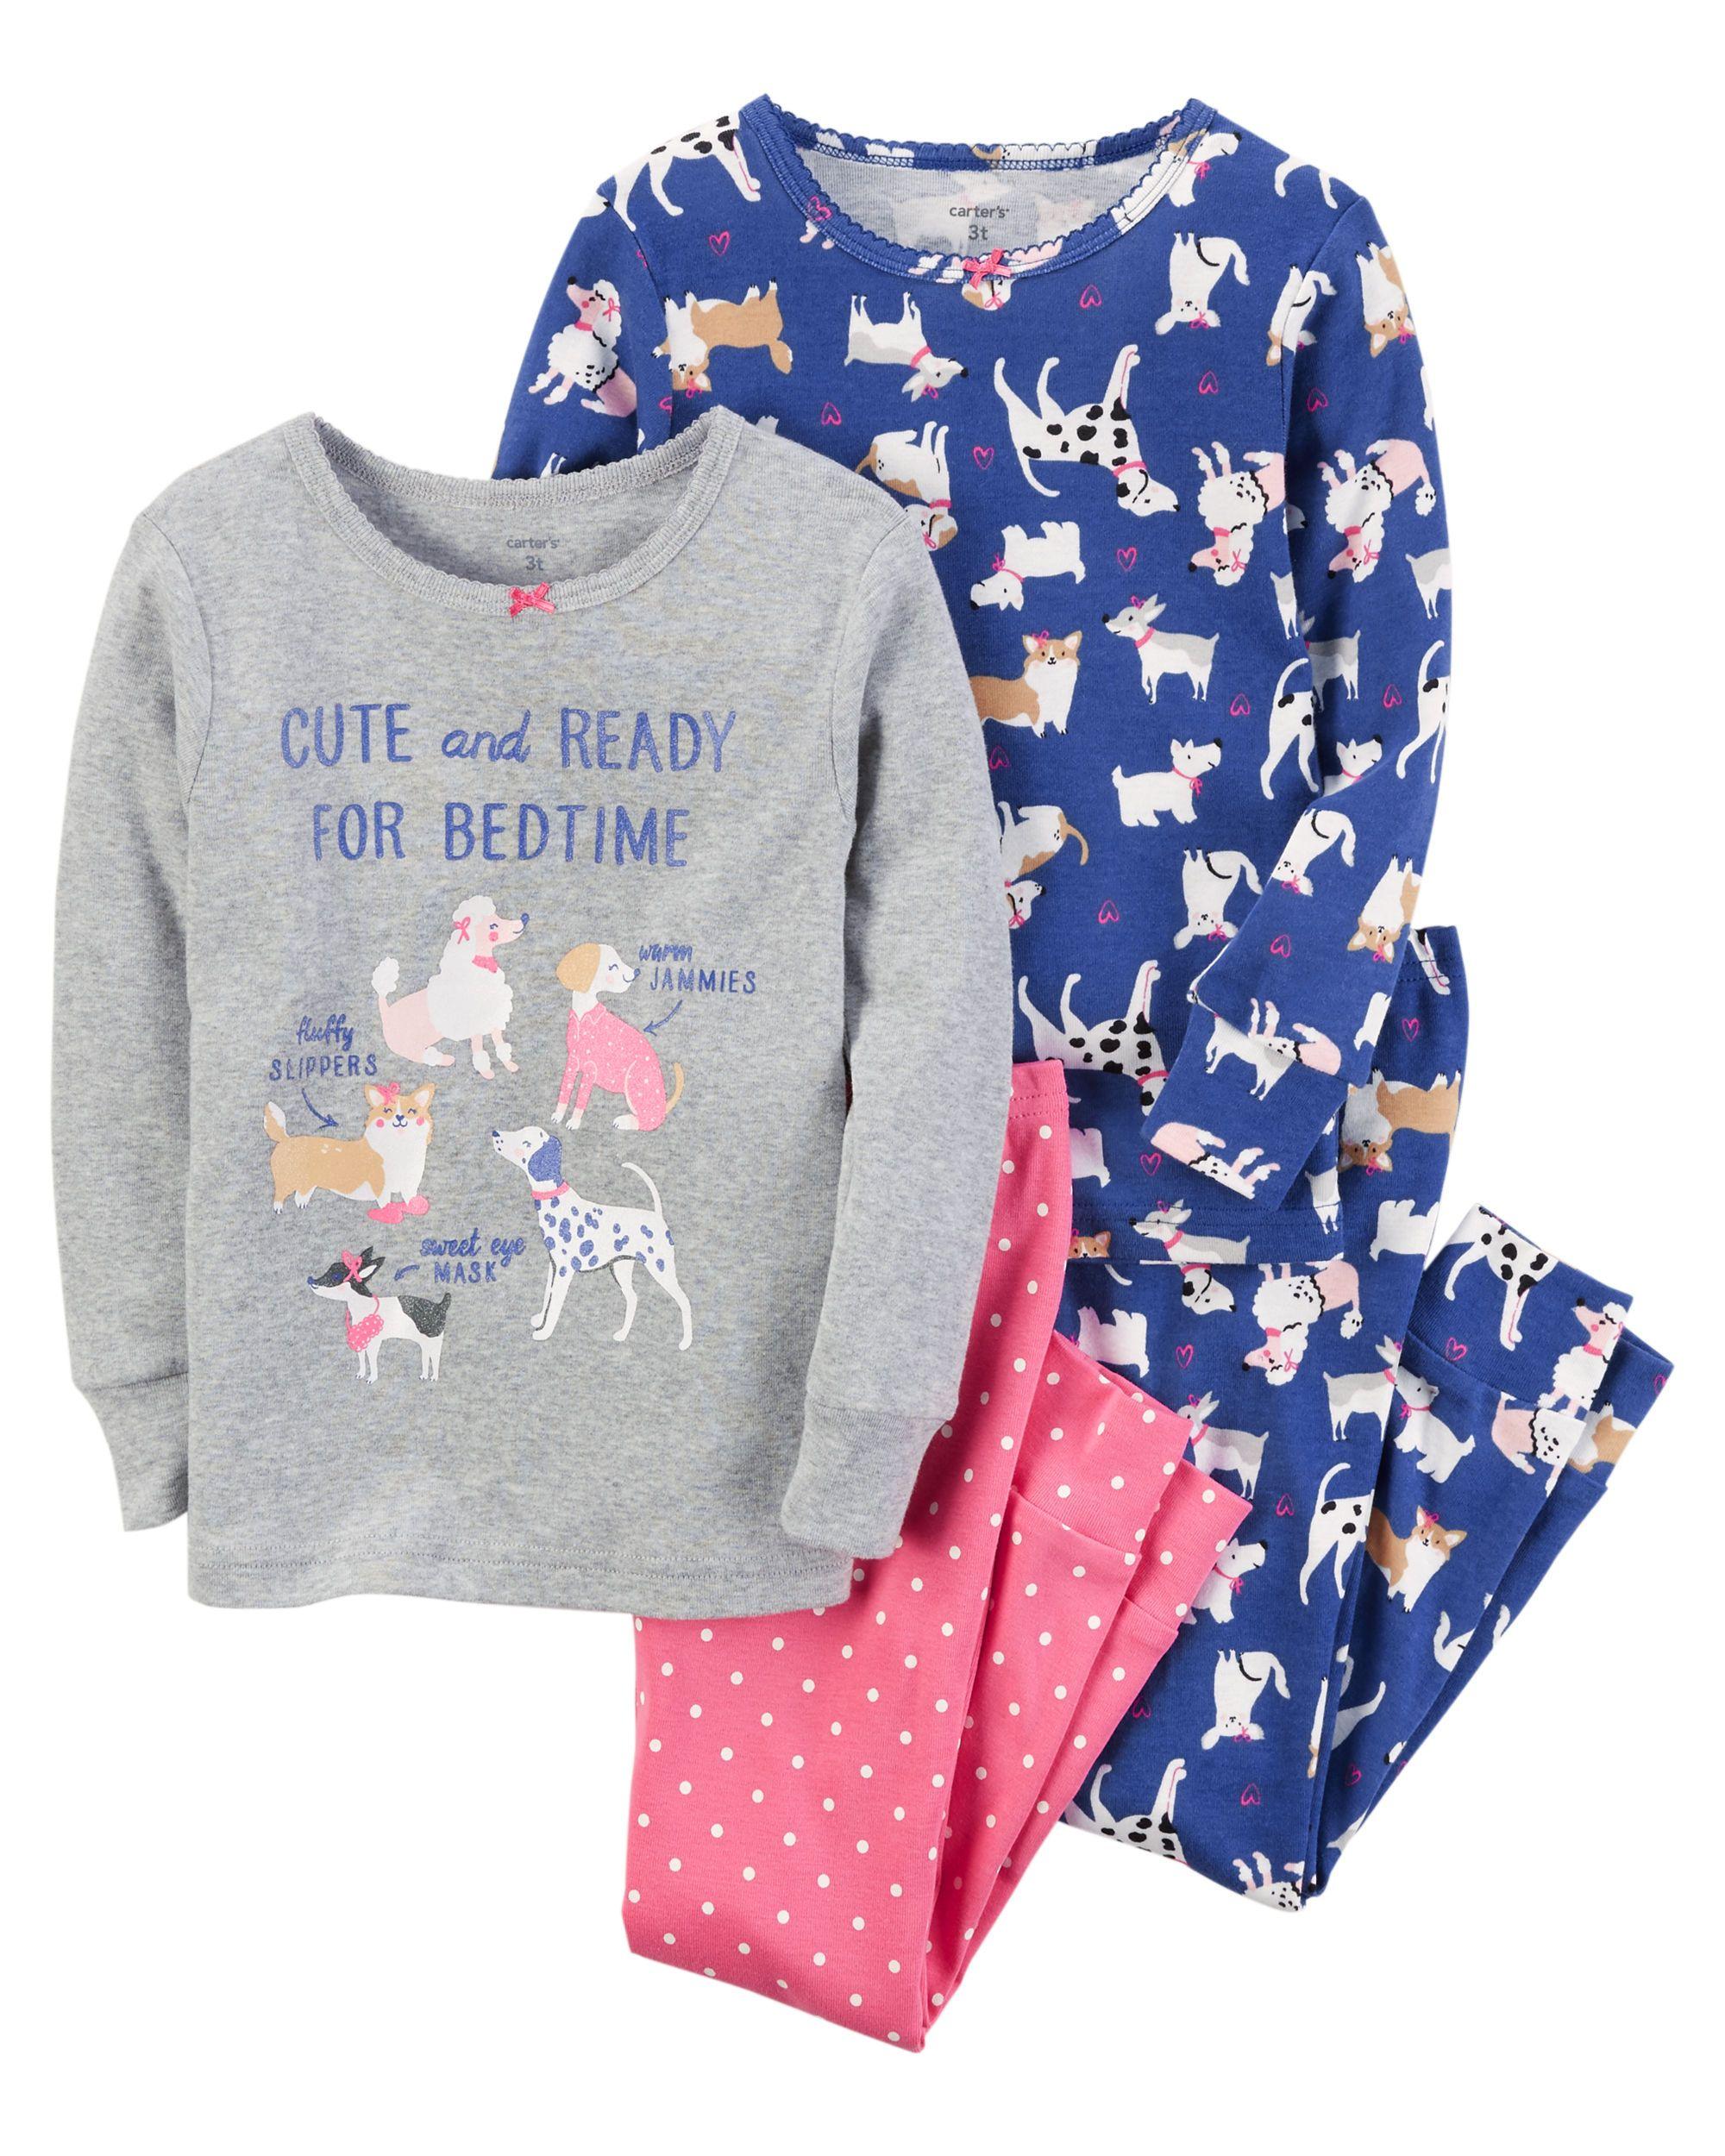 Pin de paola guarin en moda infantil   Pinterest   Pijama, Pijamas ...